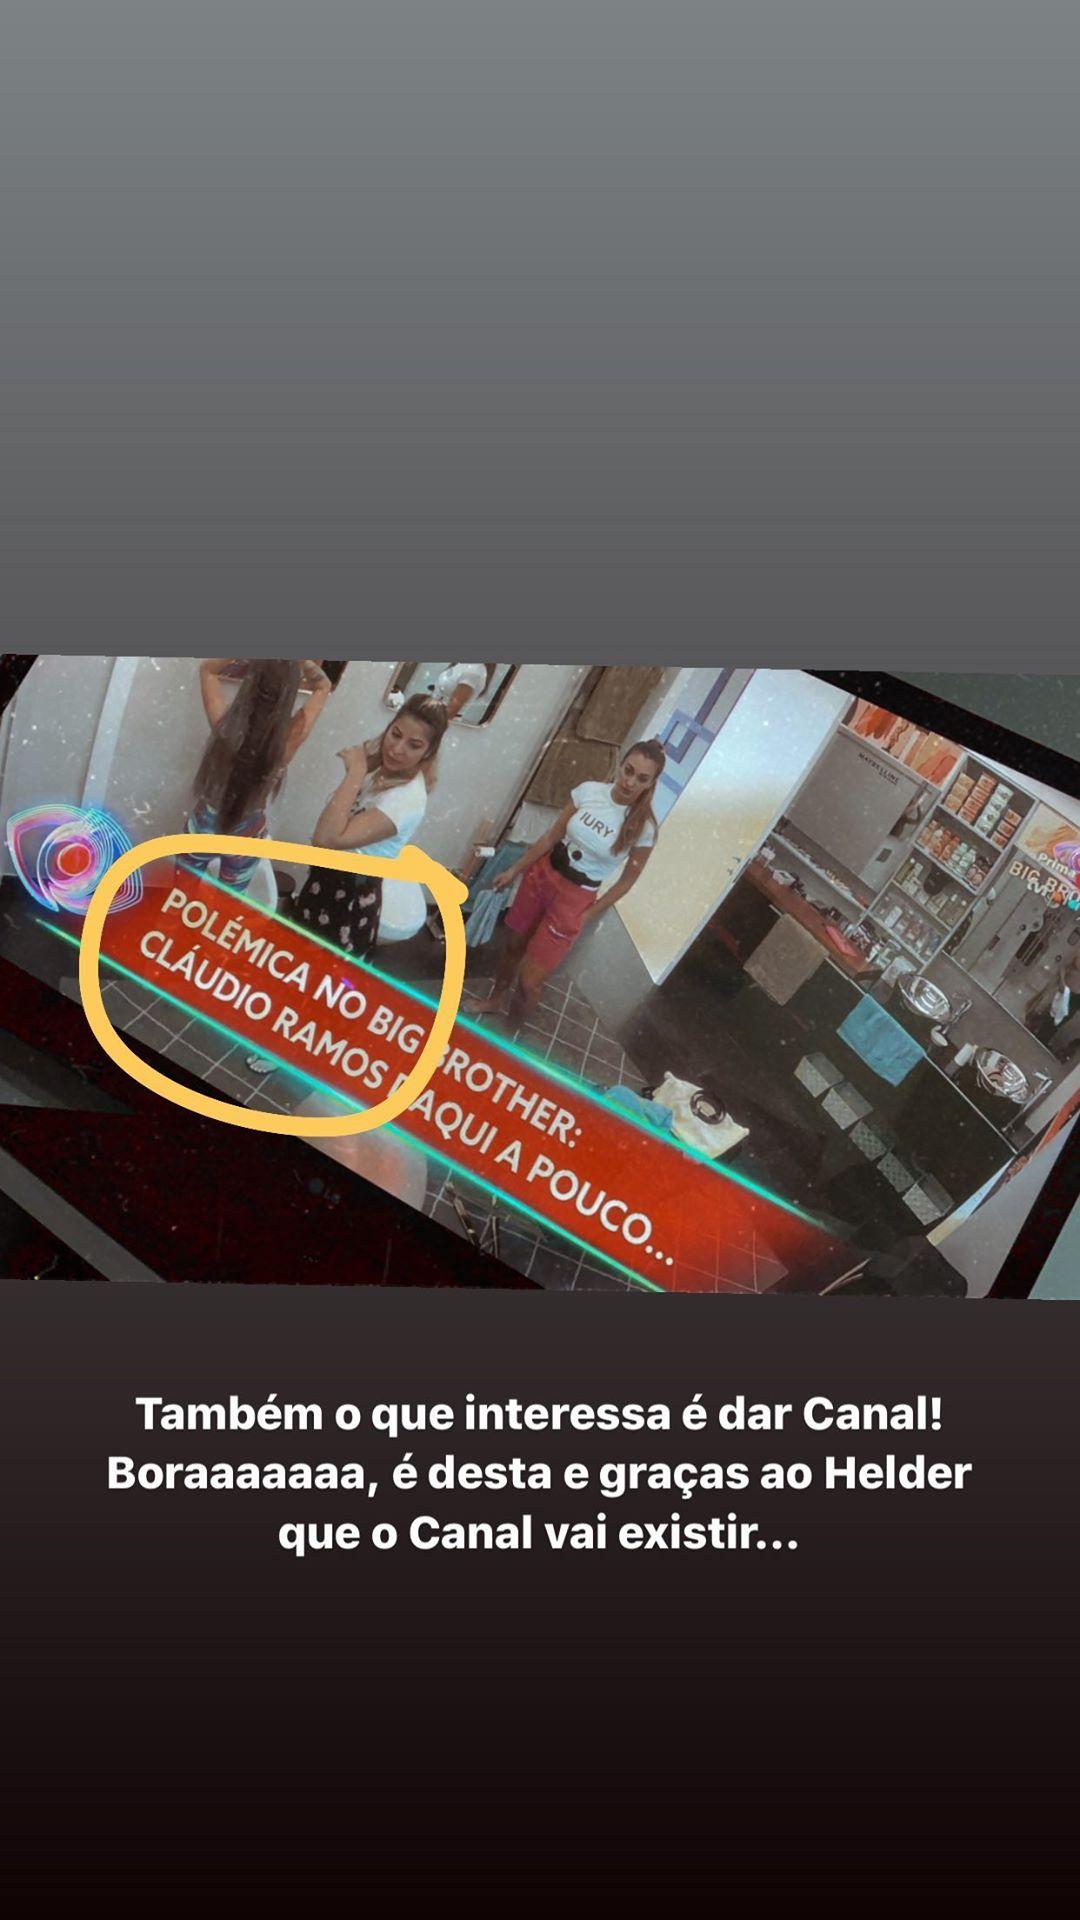 Fanny Rodrigues Helder Big Brother 2 Big Brother: Fanny Revoltada Com Decisão Da Tvi E Endemol